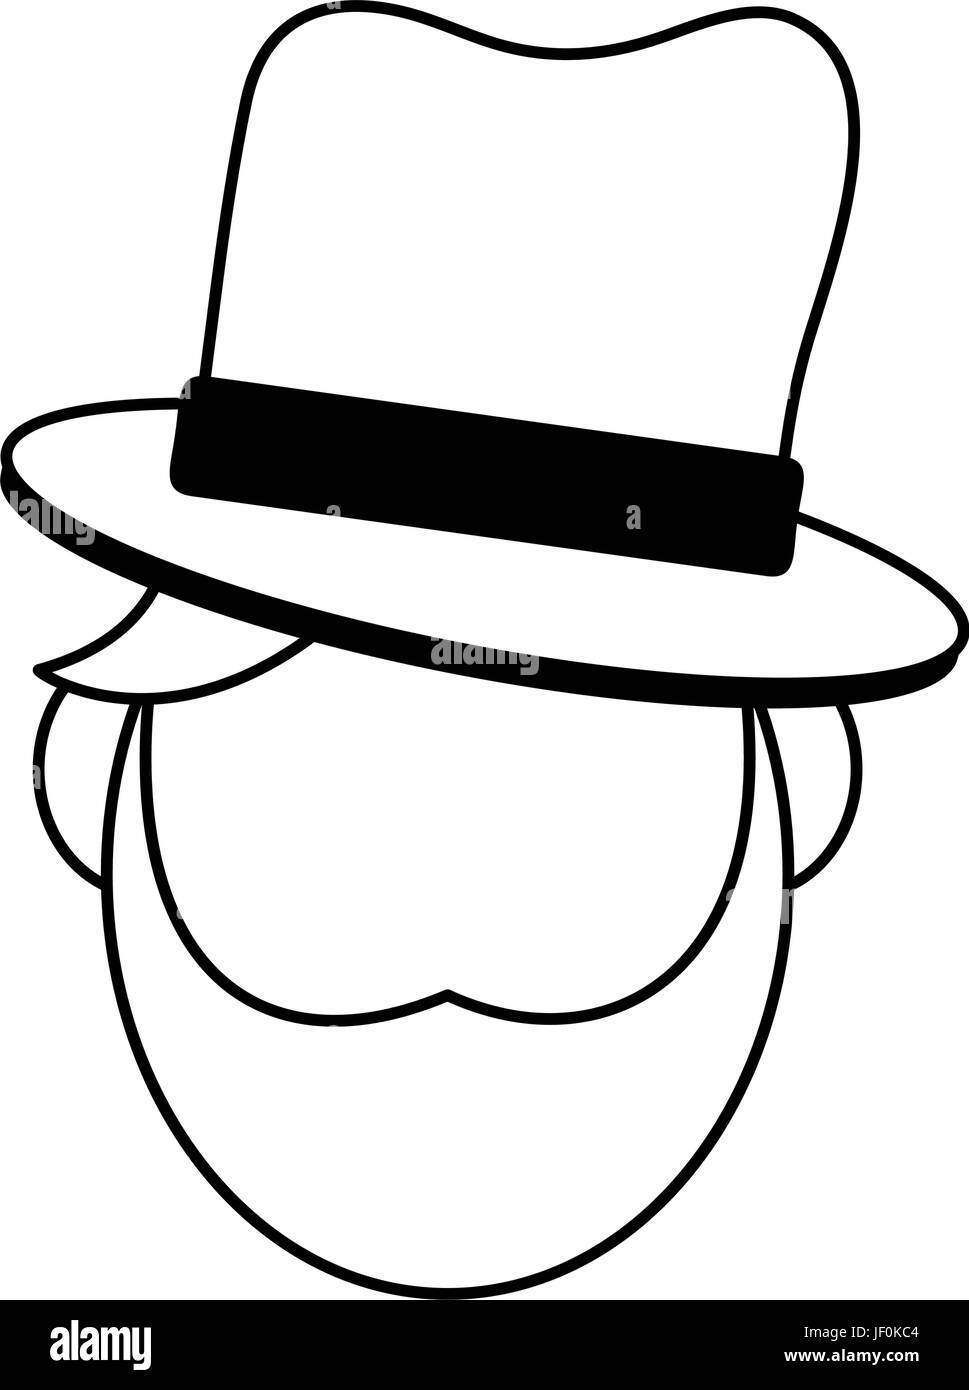 masculine hat icon image  - Stock Image